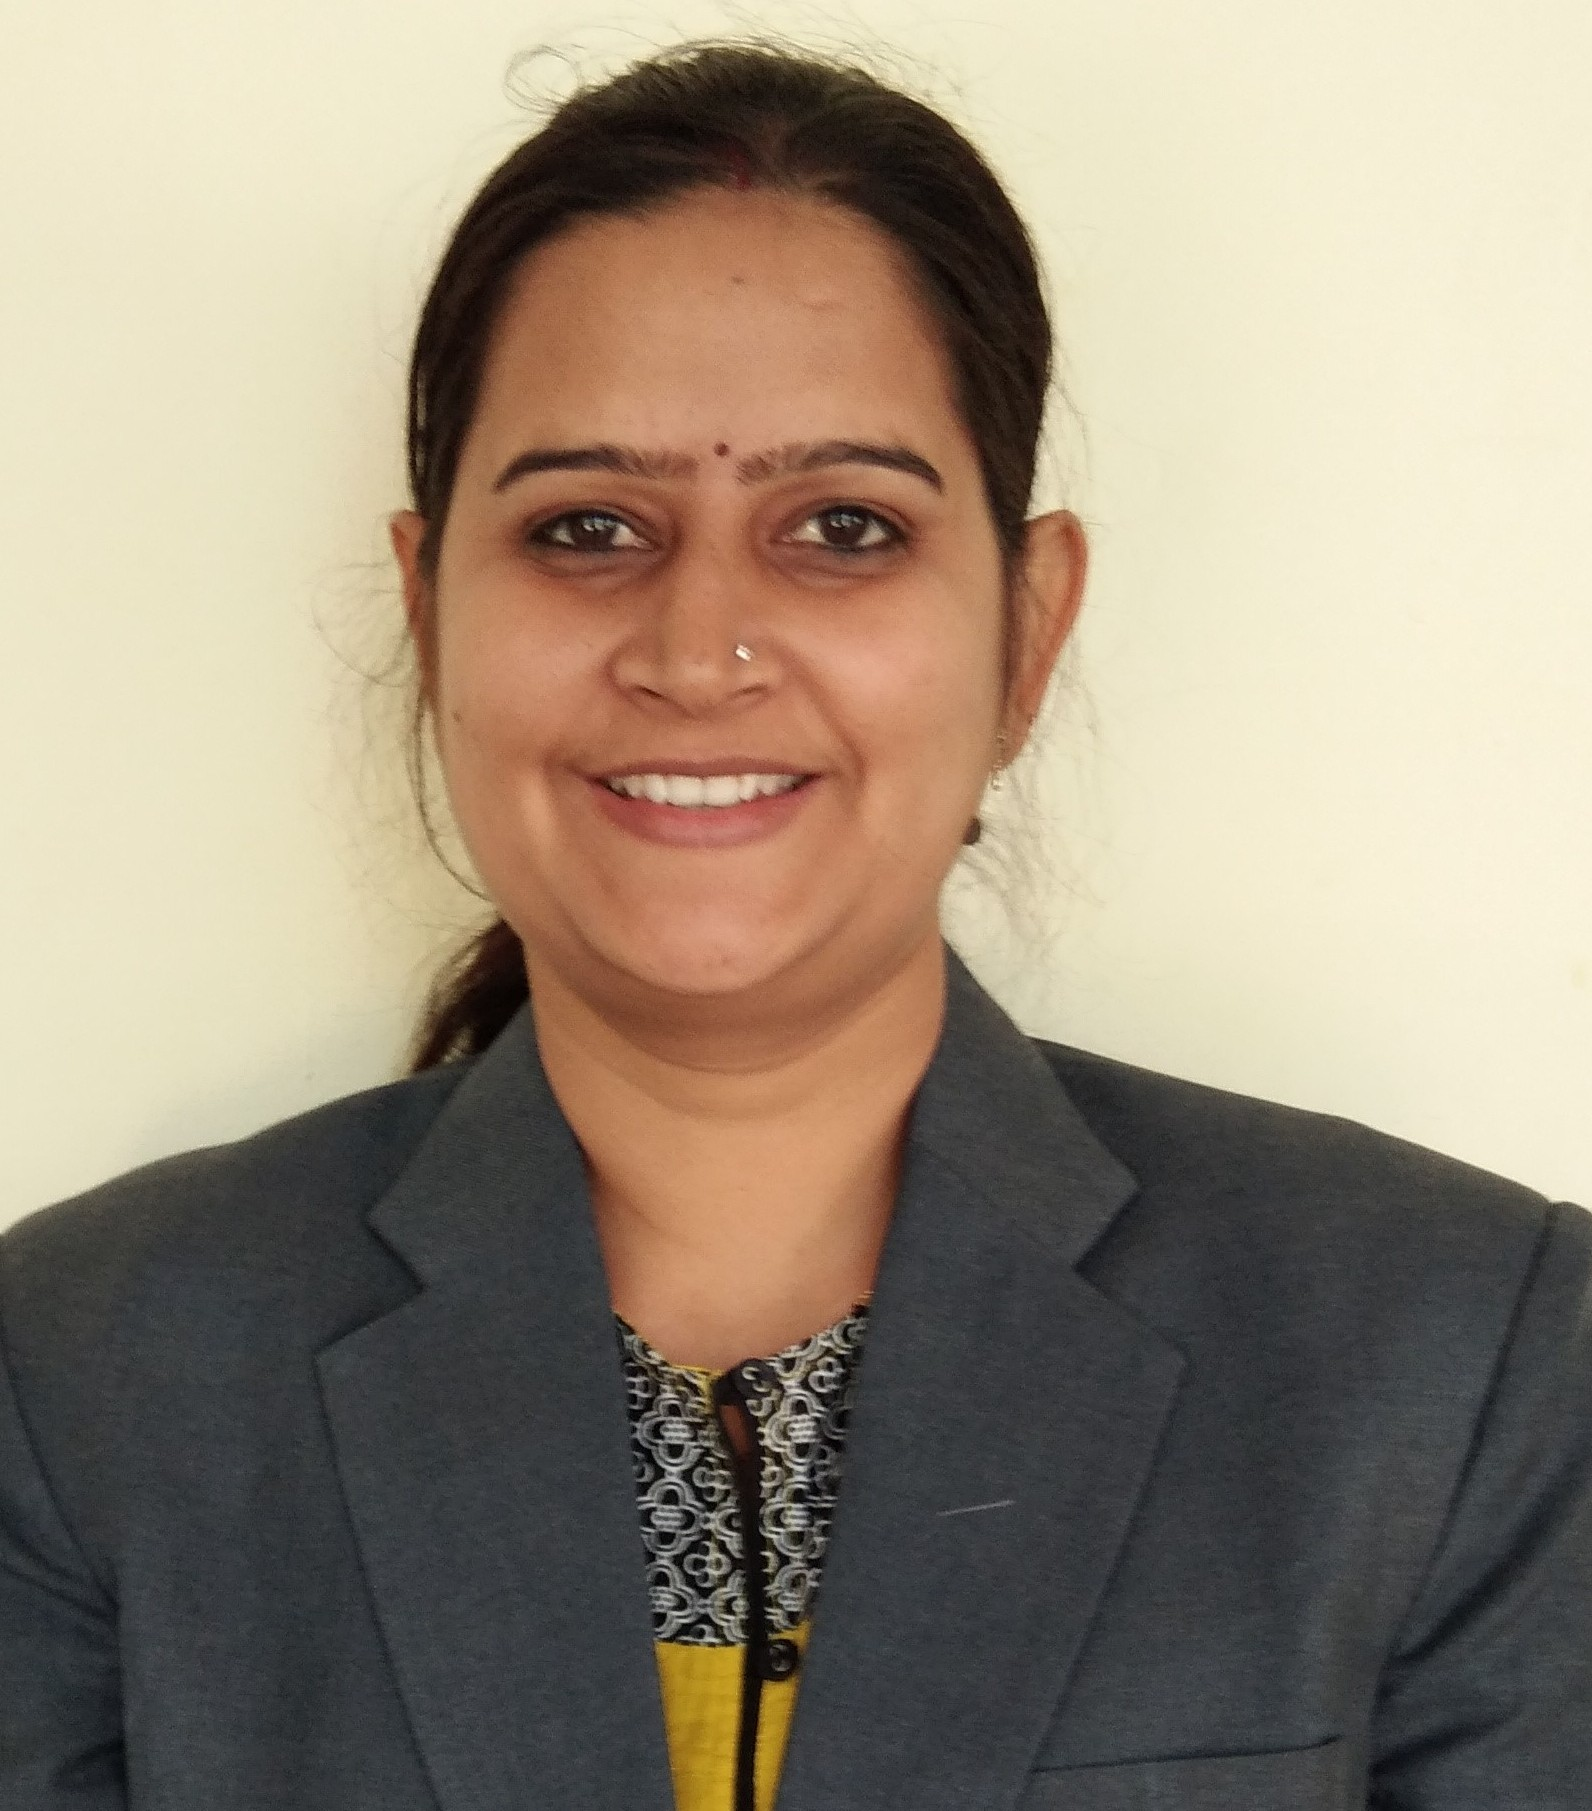 Mrs. Deepika Rathour